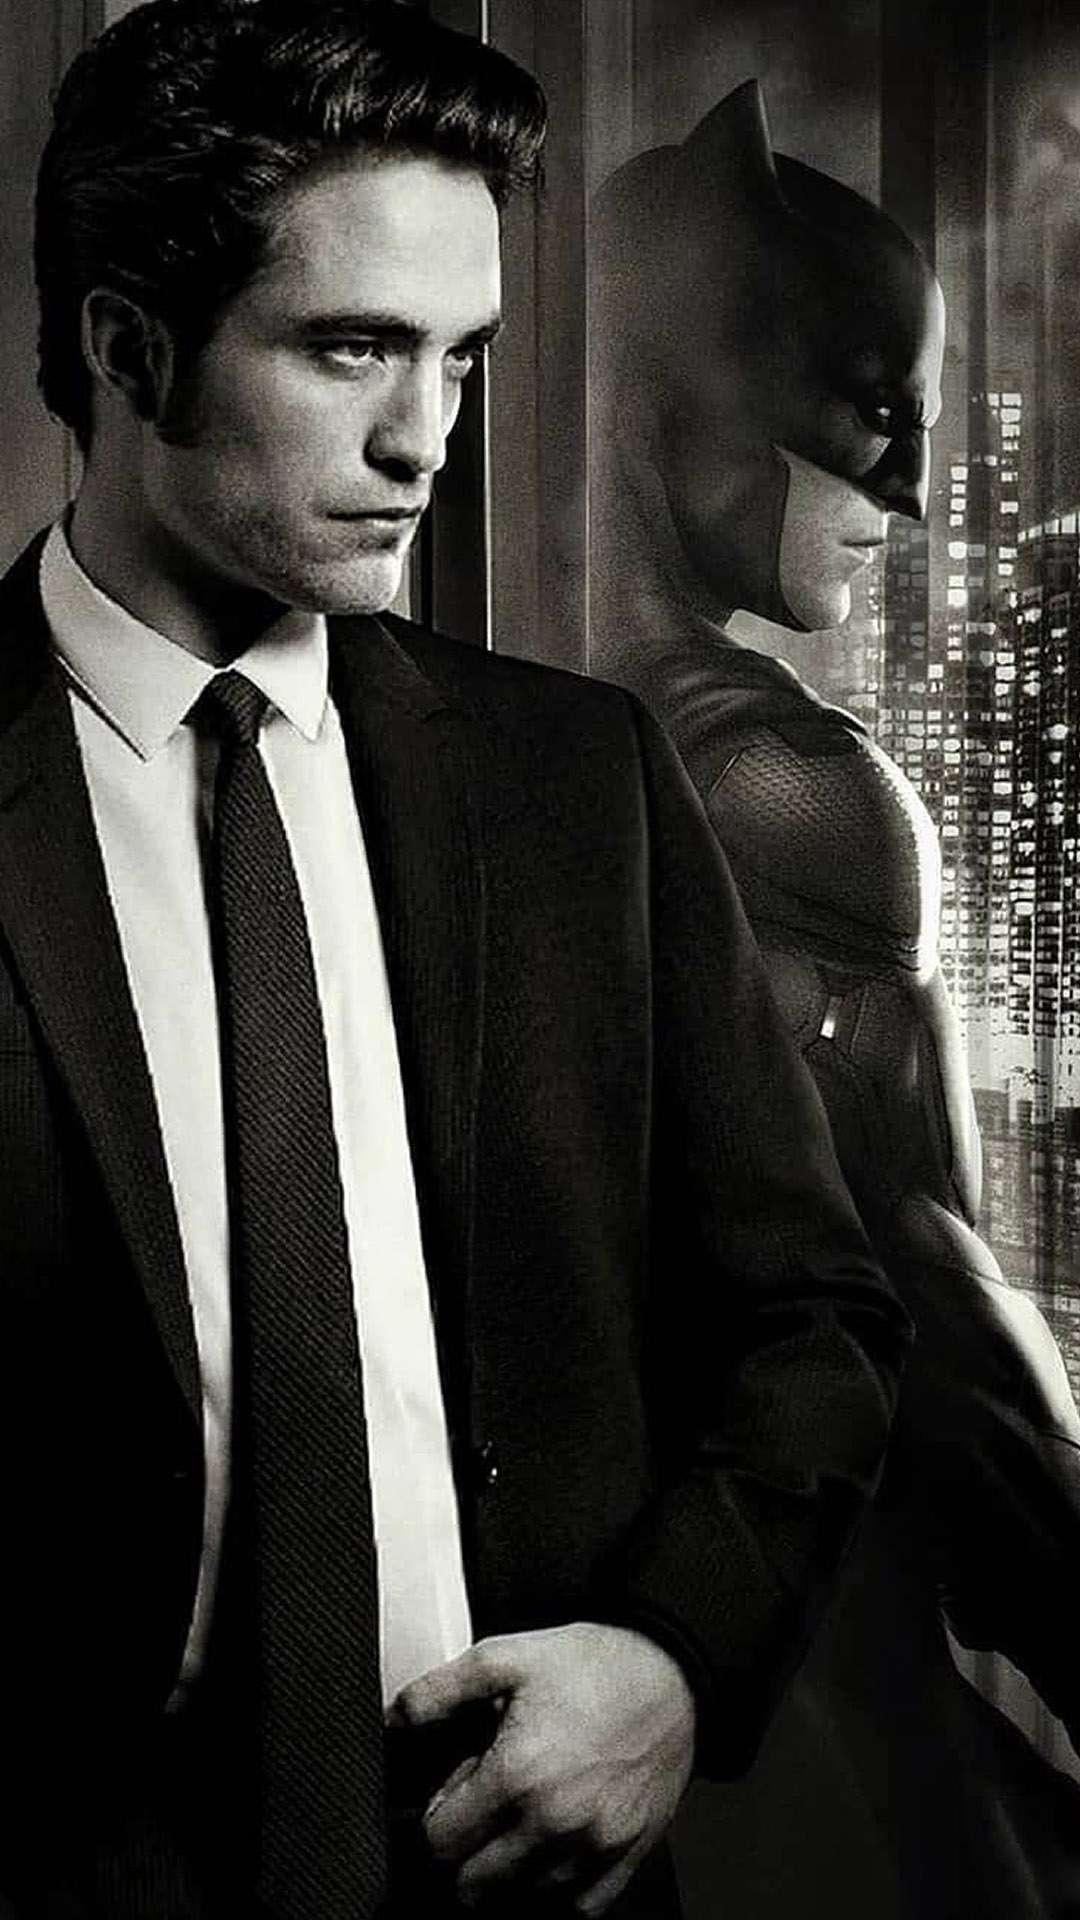 Batman Robert Pattinson iPhone Wallpaper